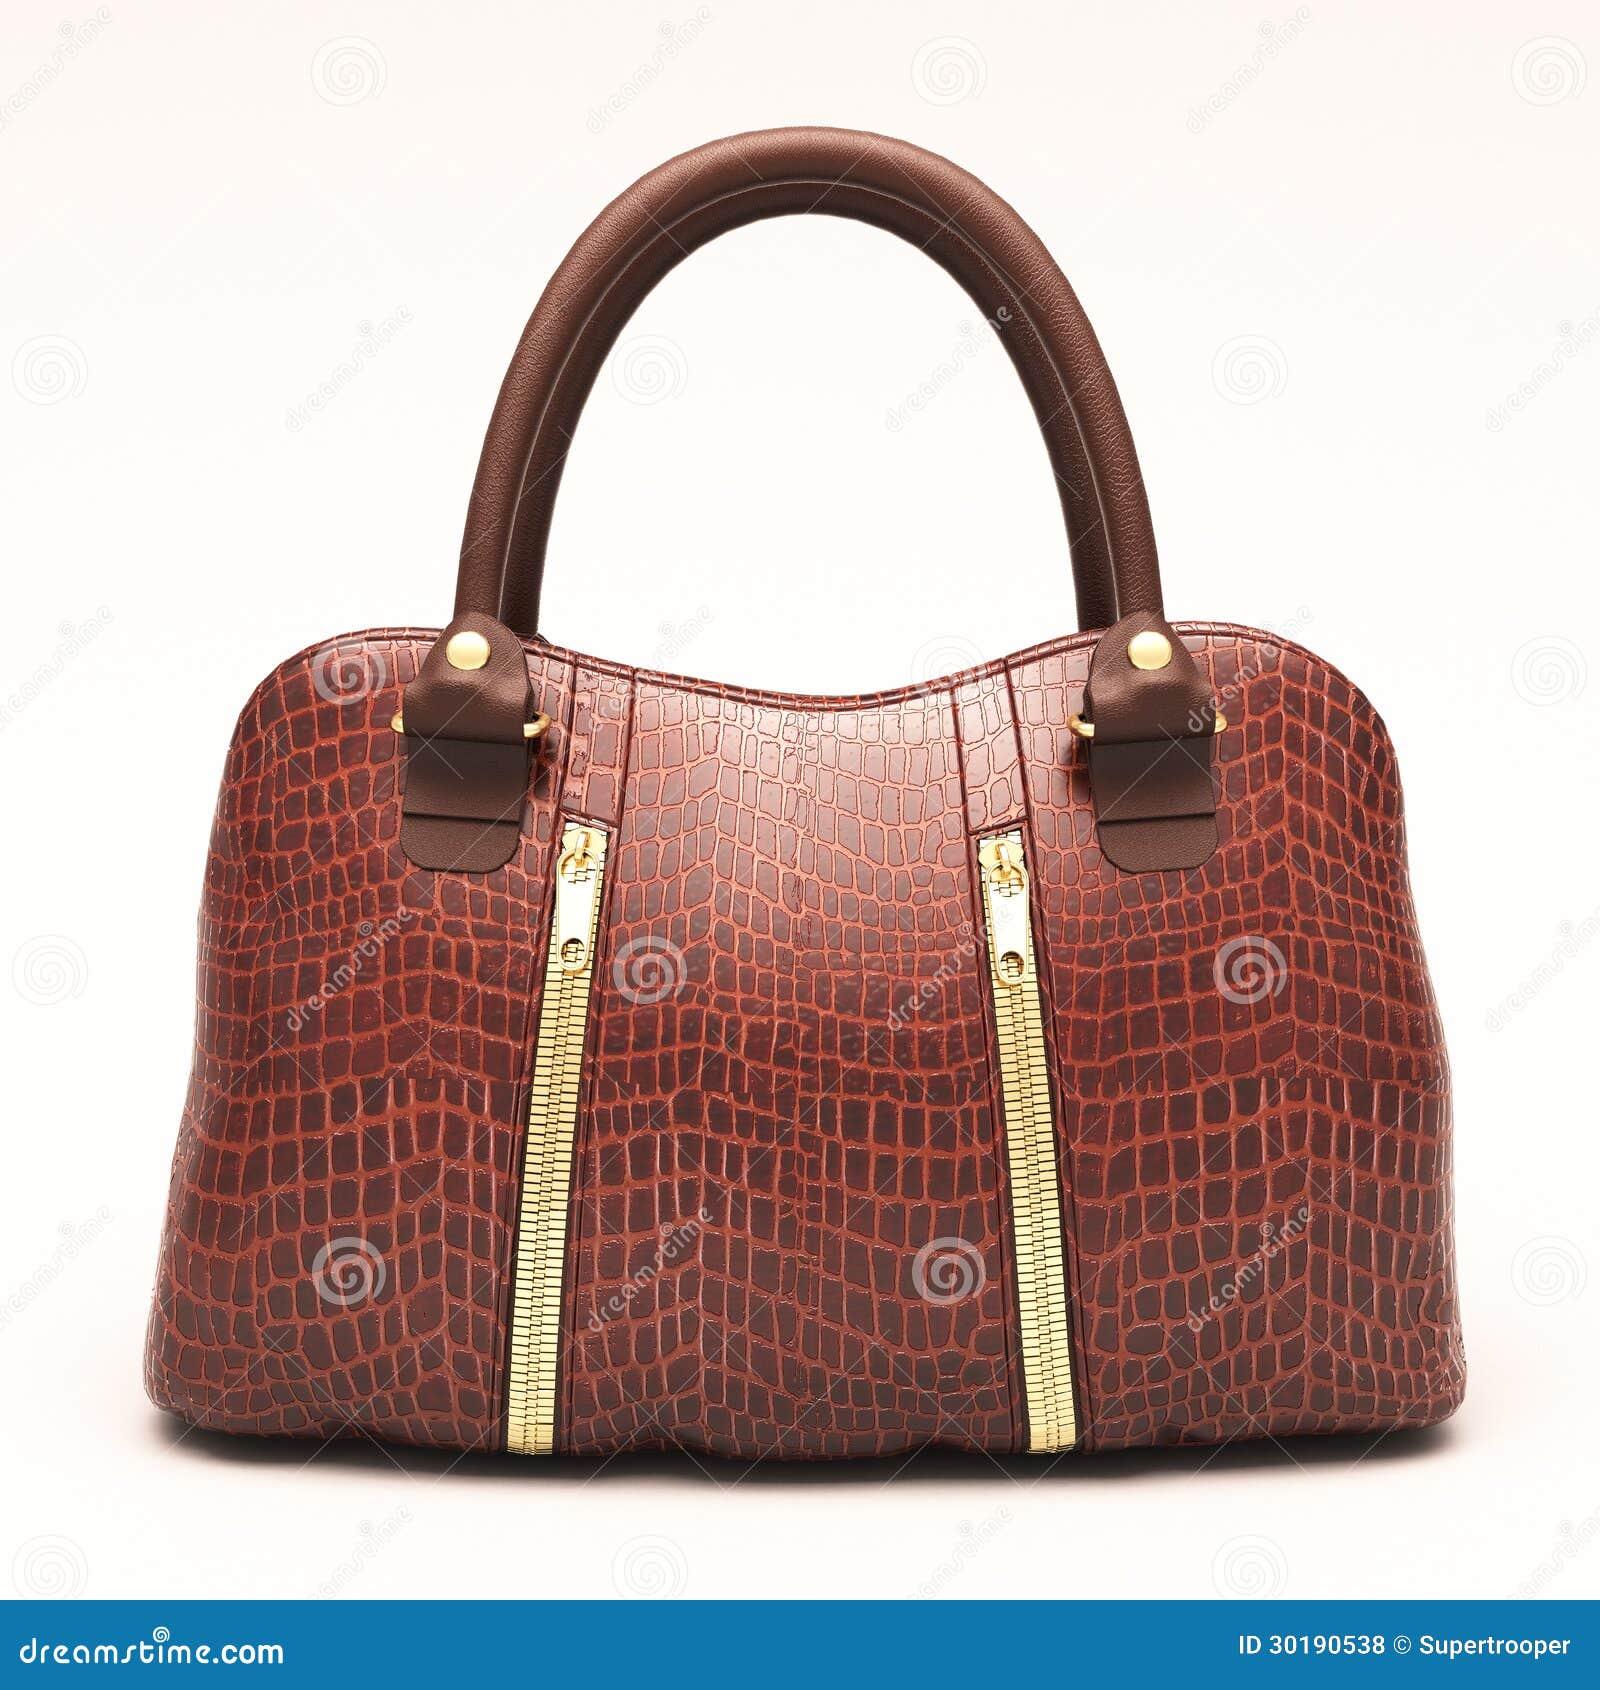 cd1b50a8e2 Τσάντα των γυναικών δέρματος κροκοδείλων που απομονώνεται στο άσπρο υπόβαθρο